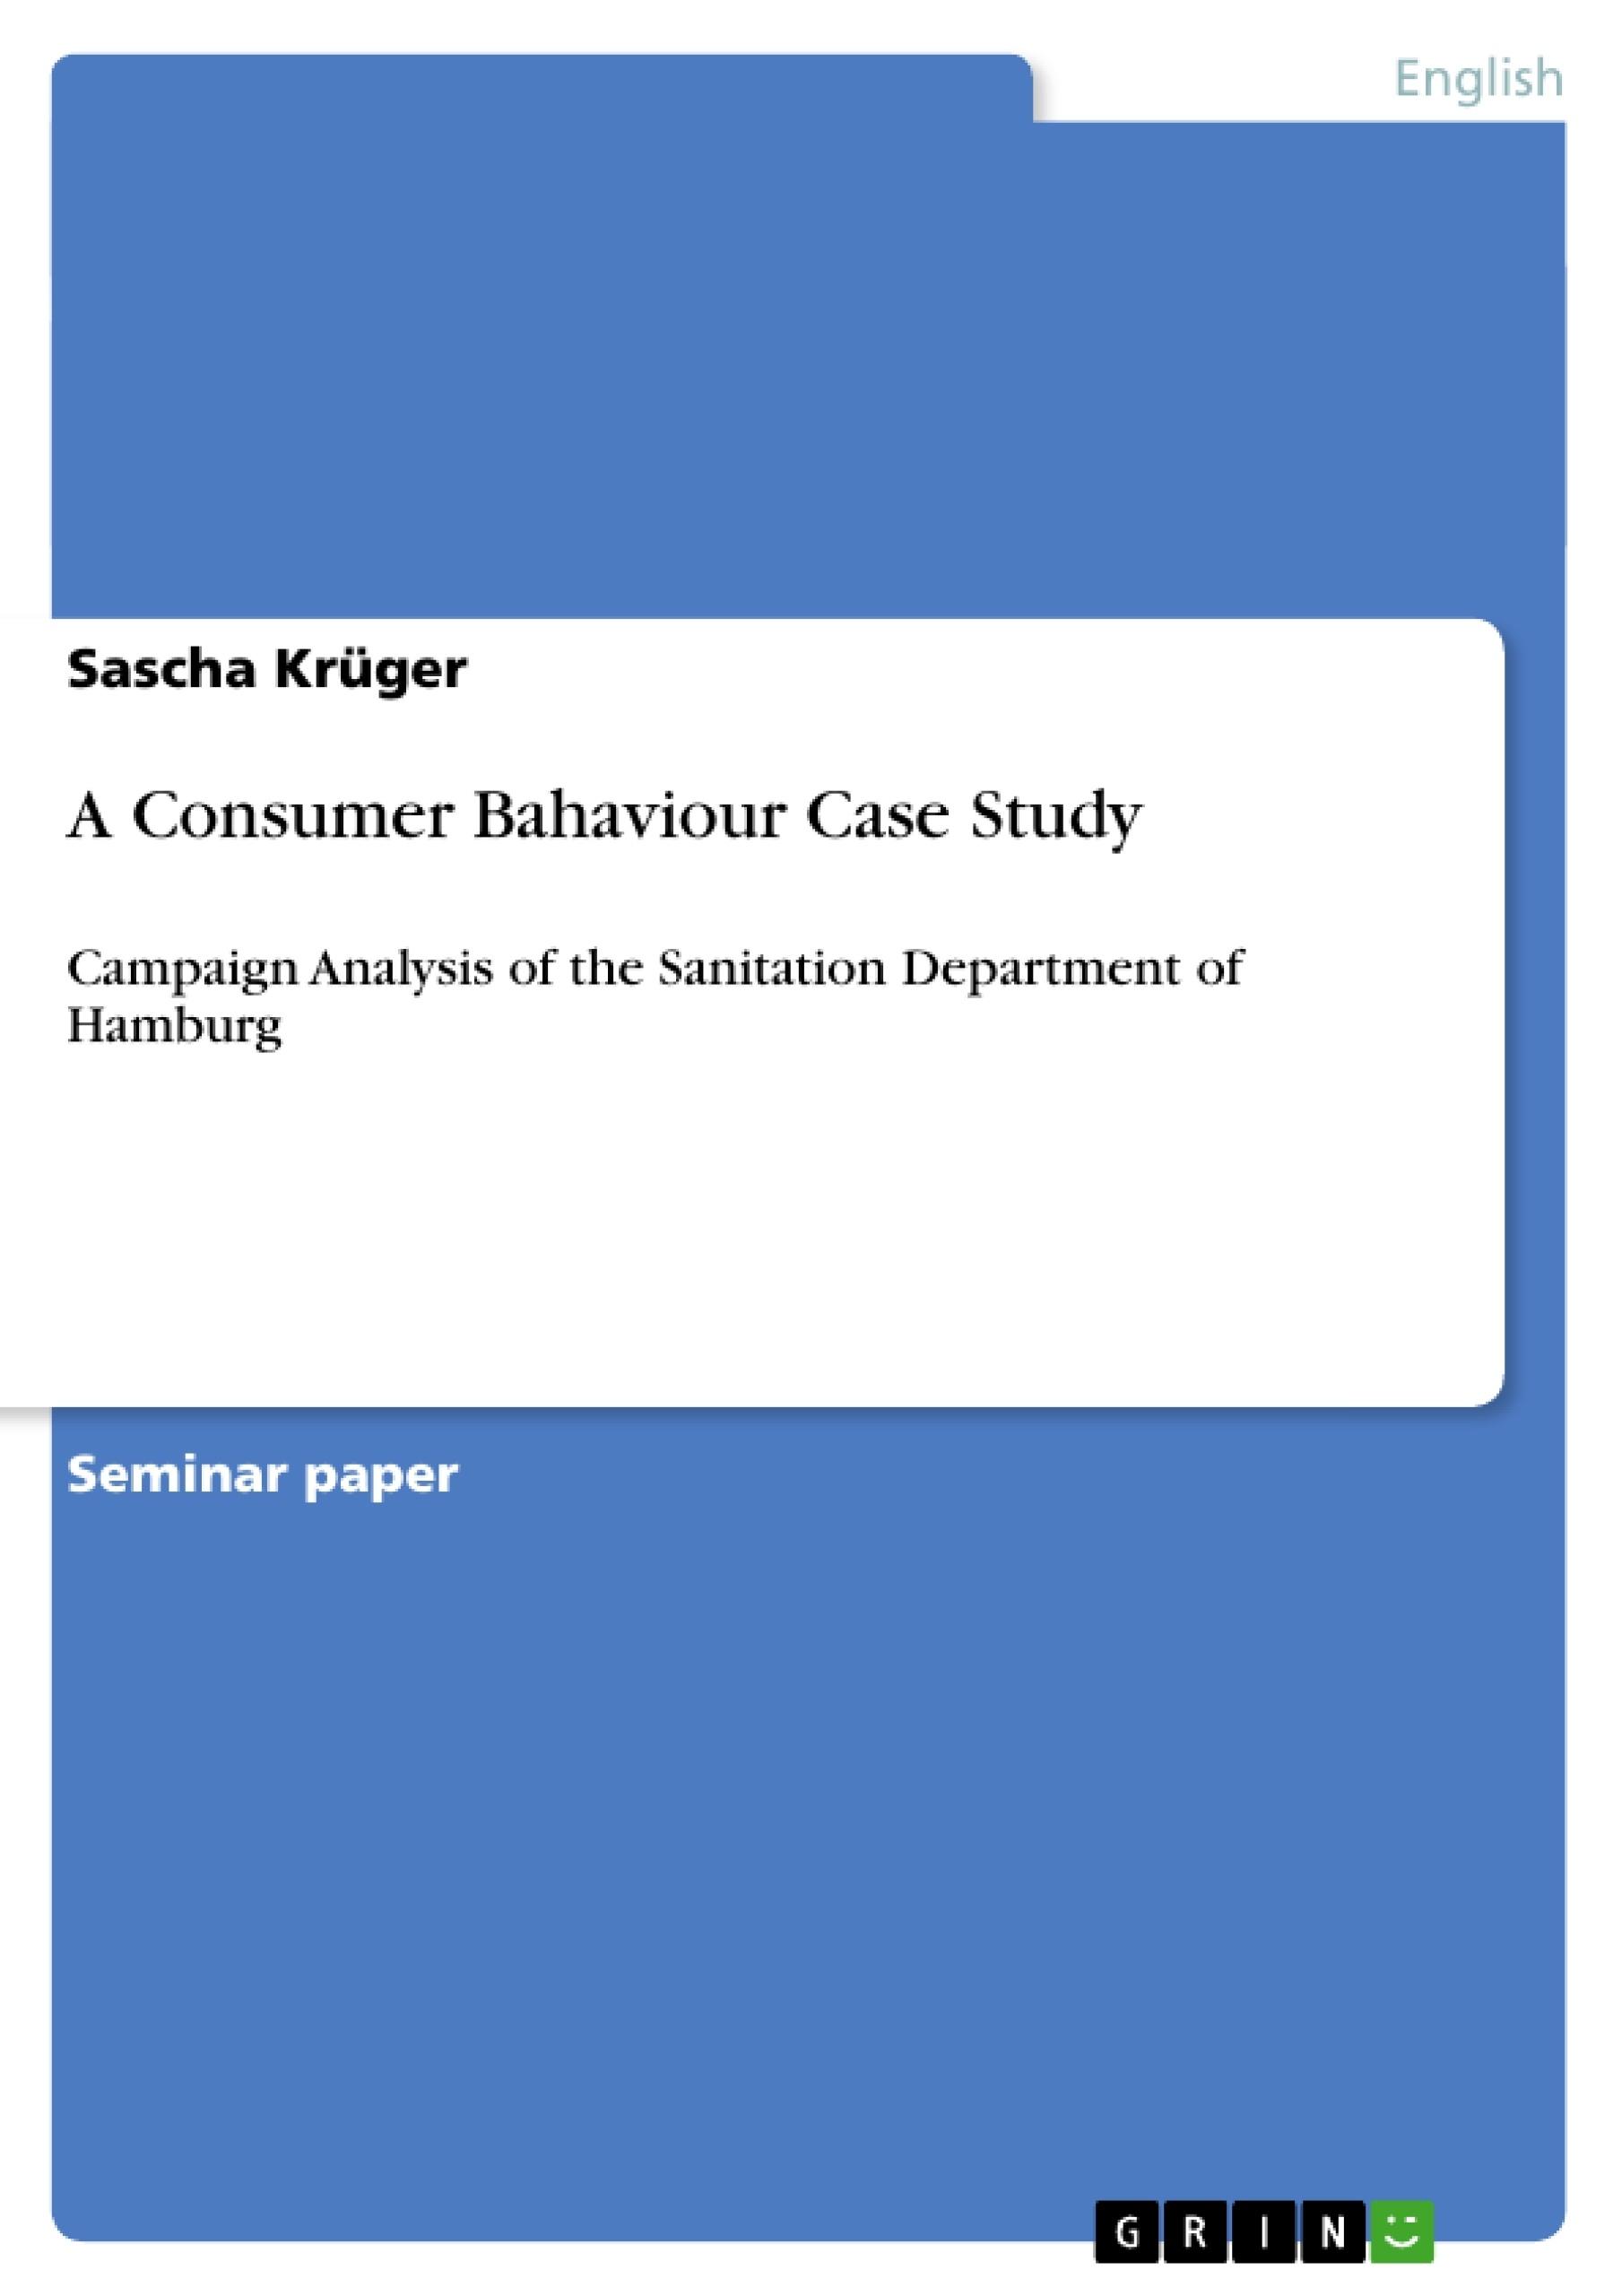 Title: A Consumer Bahaviour Case Study